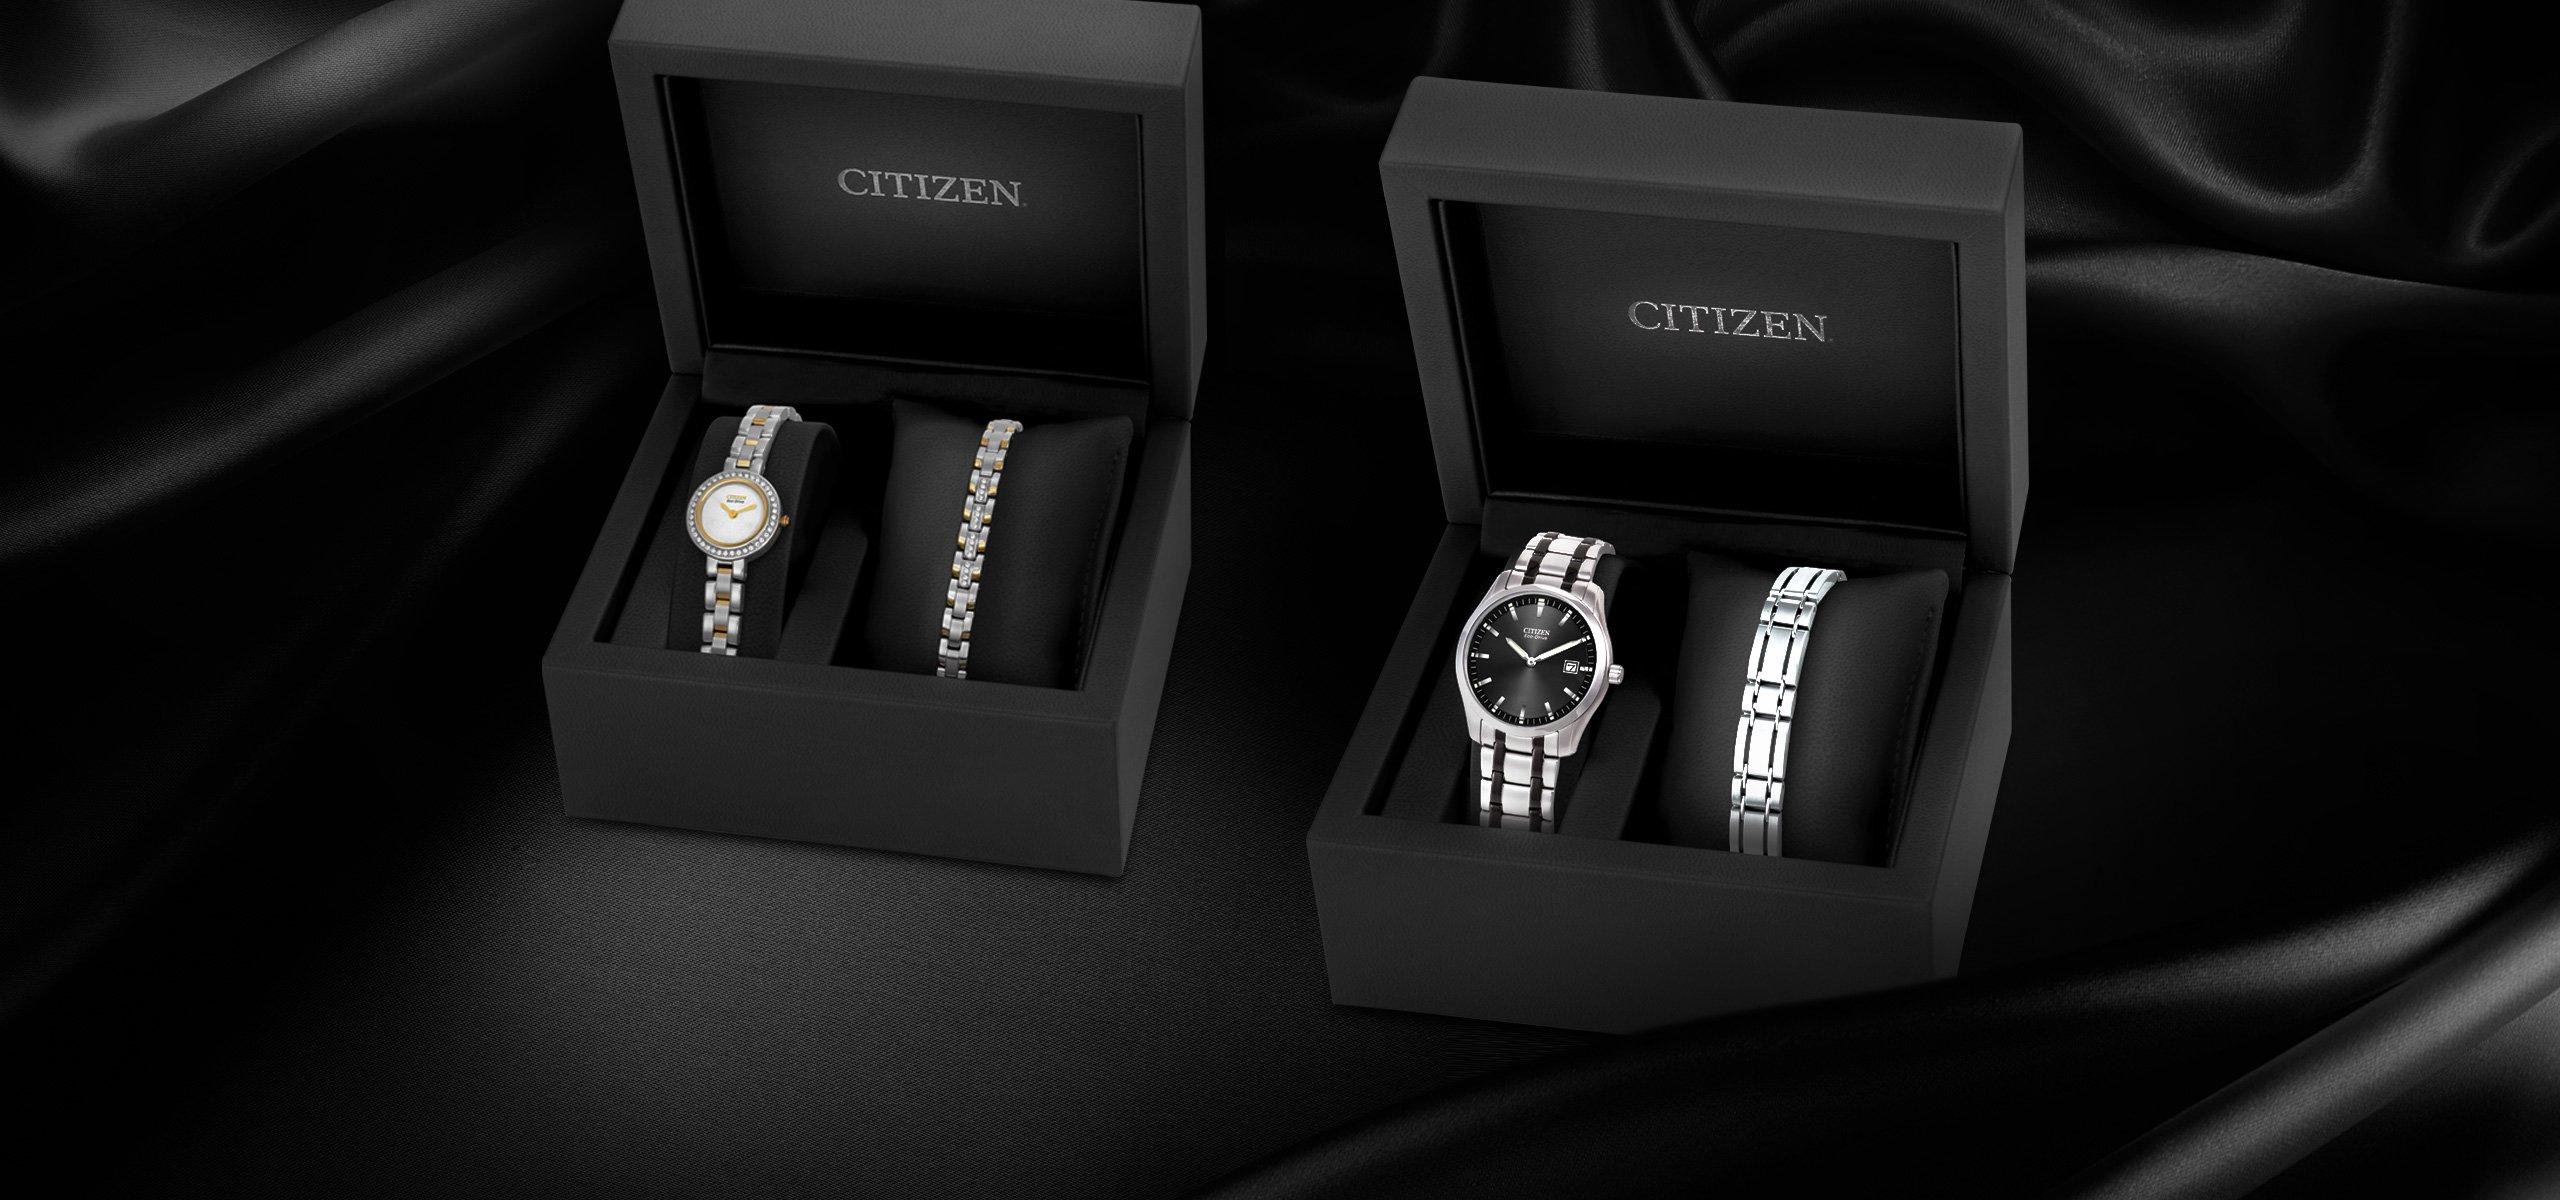 citizen-photography_BOX-SET